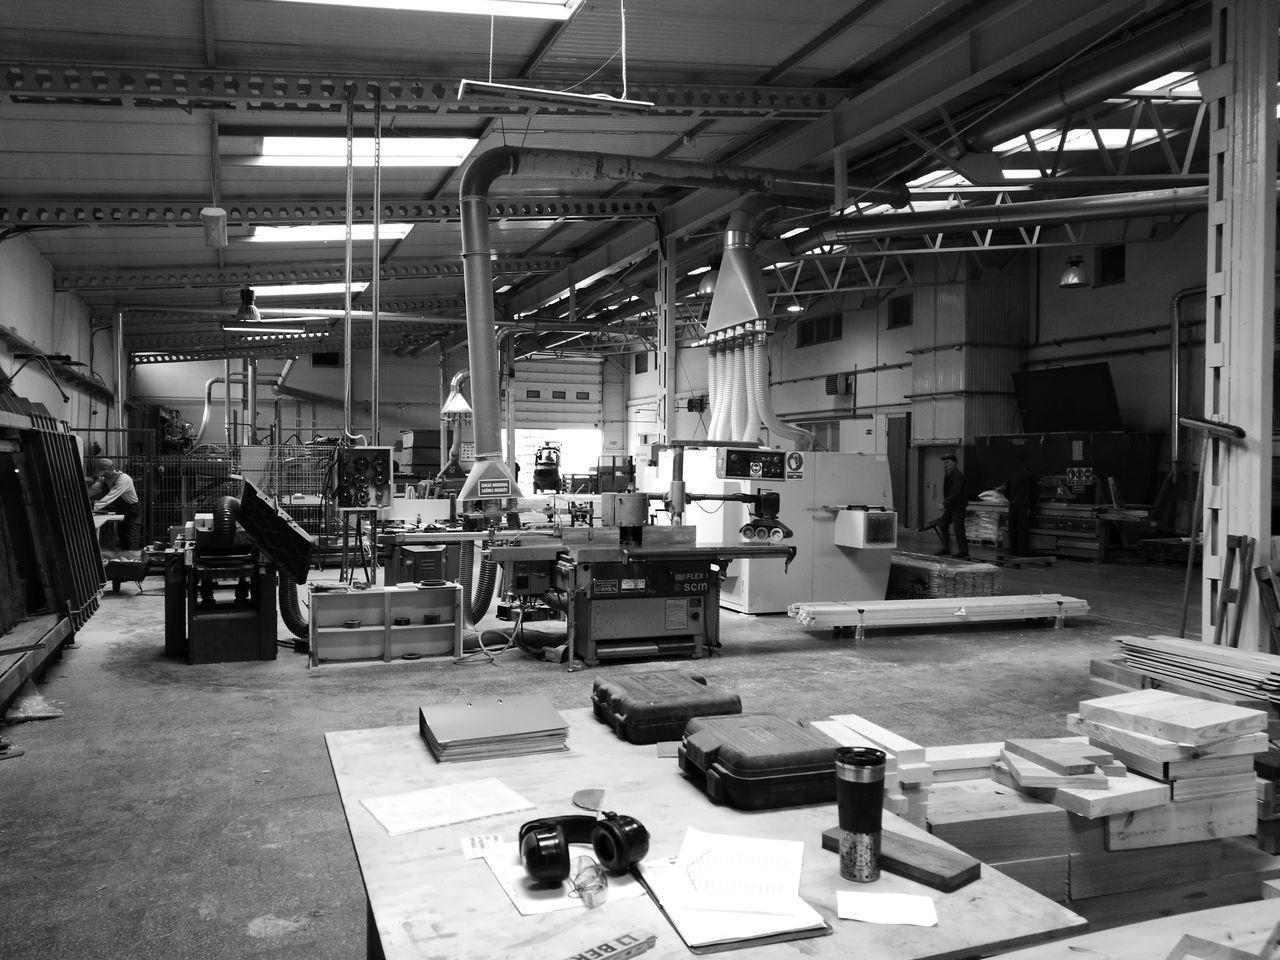 First Eyeem Photo EyeEmNewHere Blackandwhite In Work Factory Industry Smartphonephotography